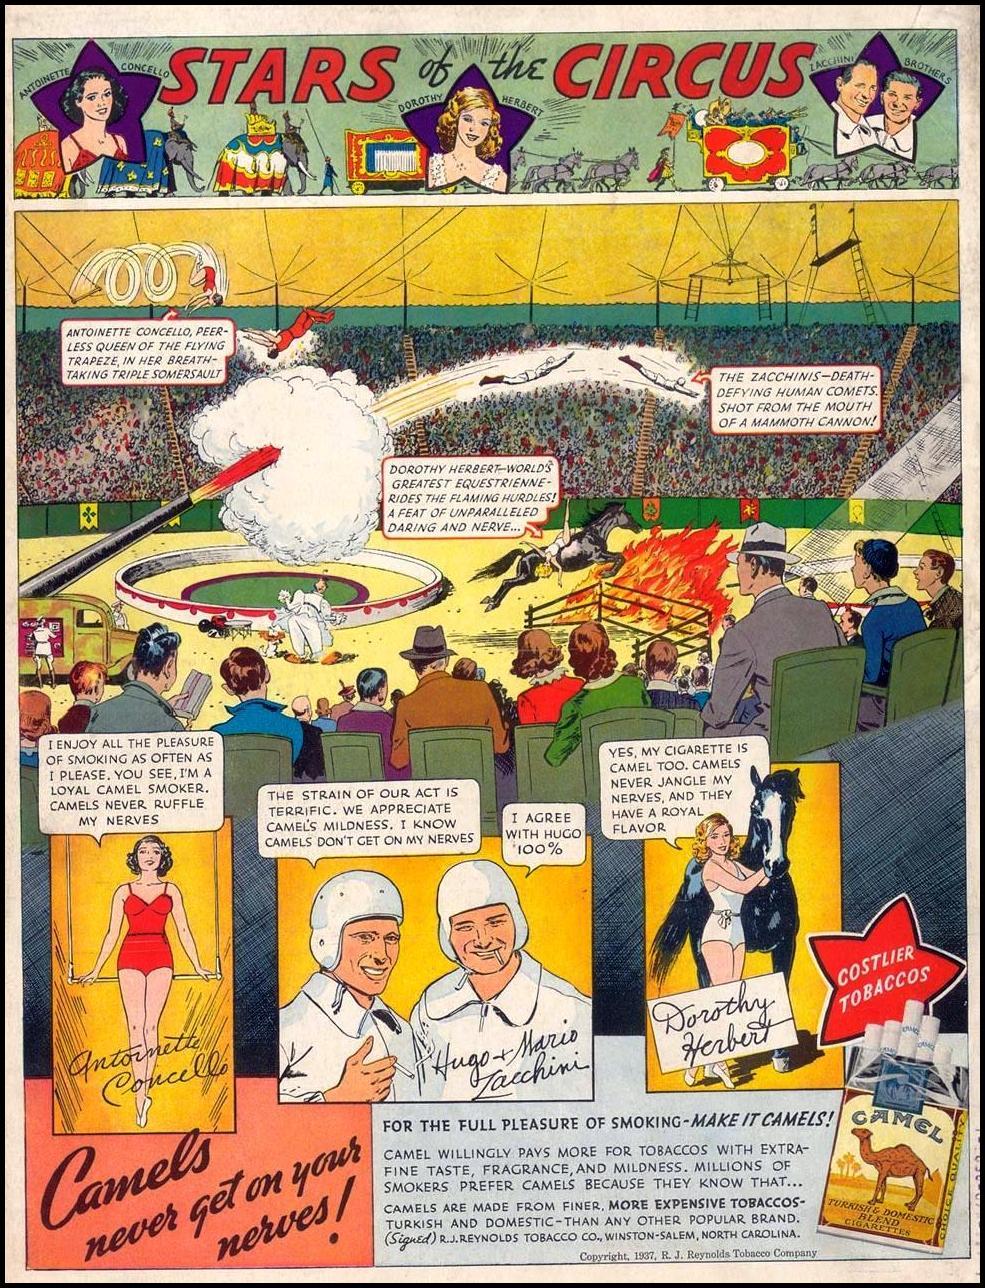 CAMEL CIGARETTES LIFE 09/13/1937 BACK COVER